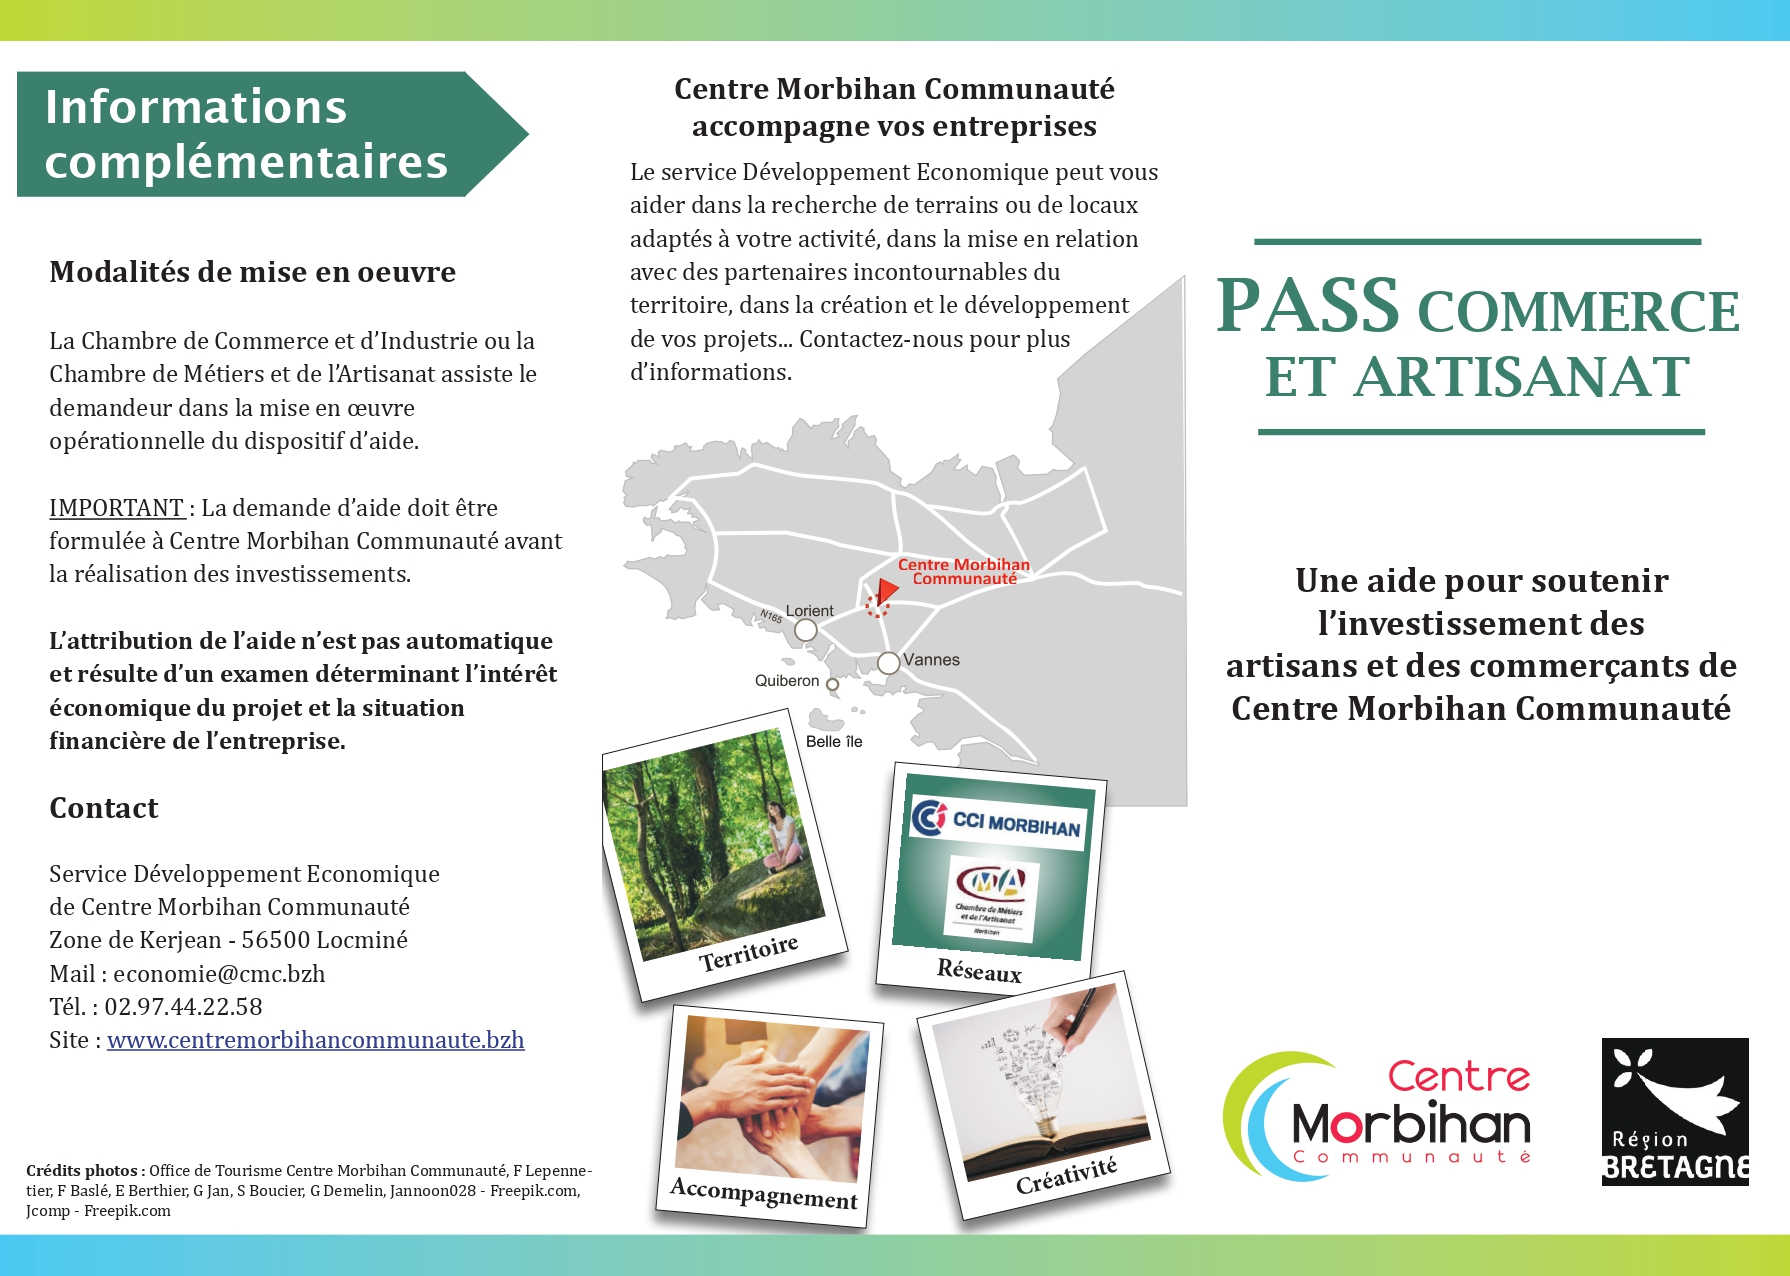 Plaquette communication PASS C_A V3_page-0001.jpg